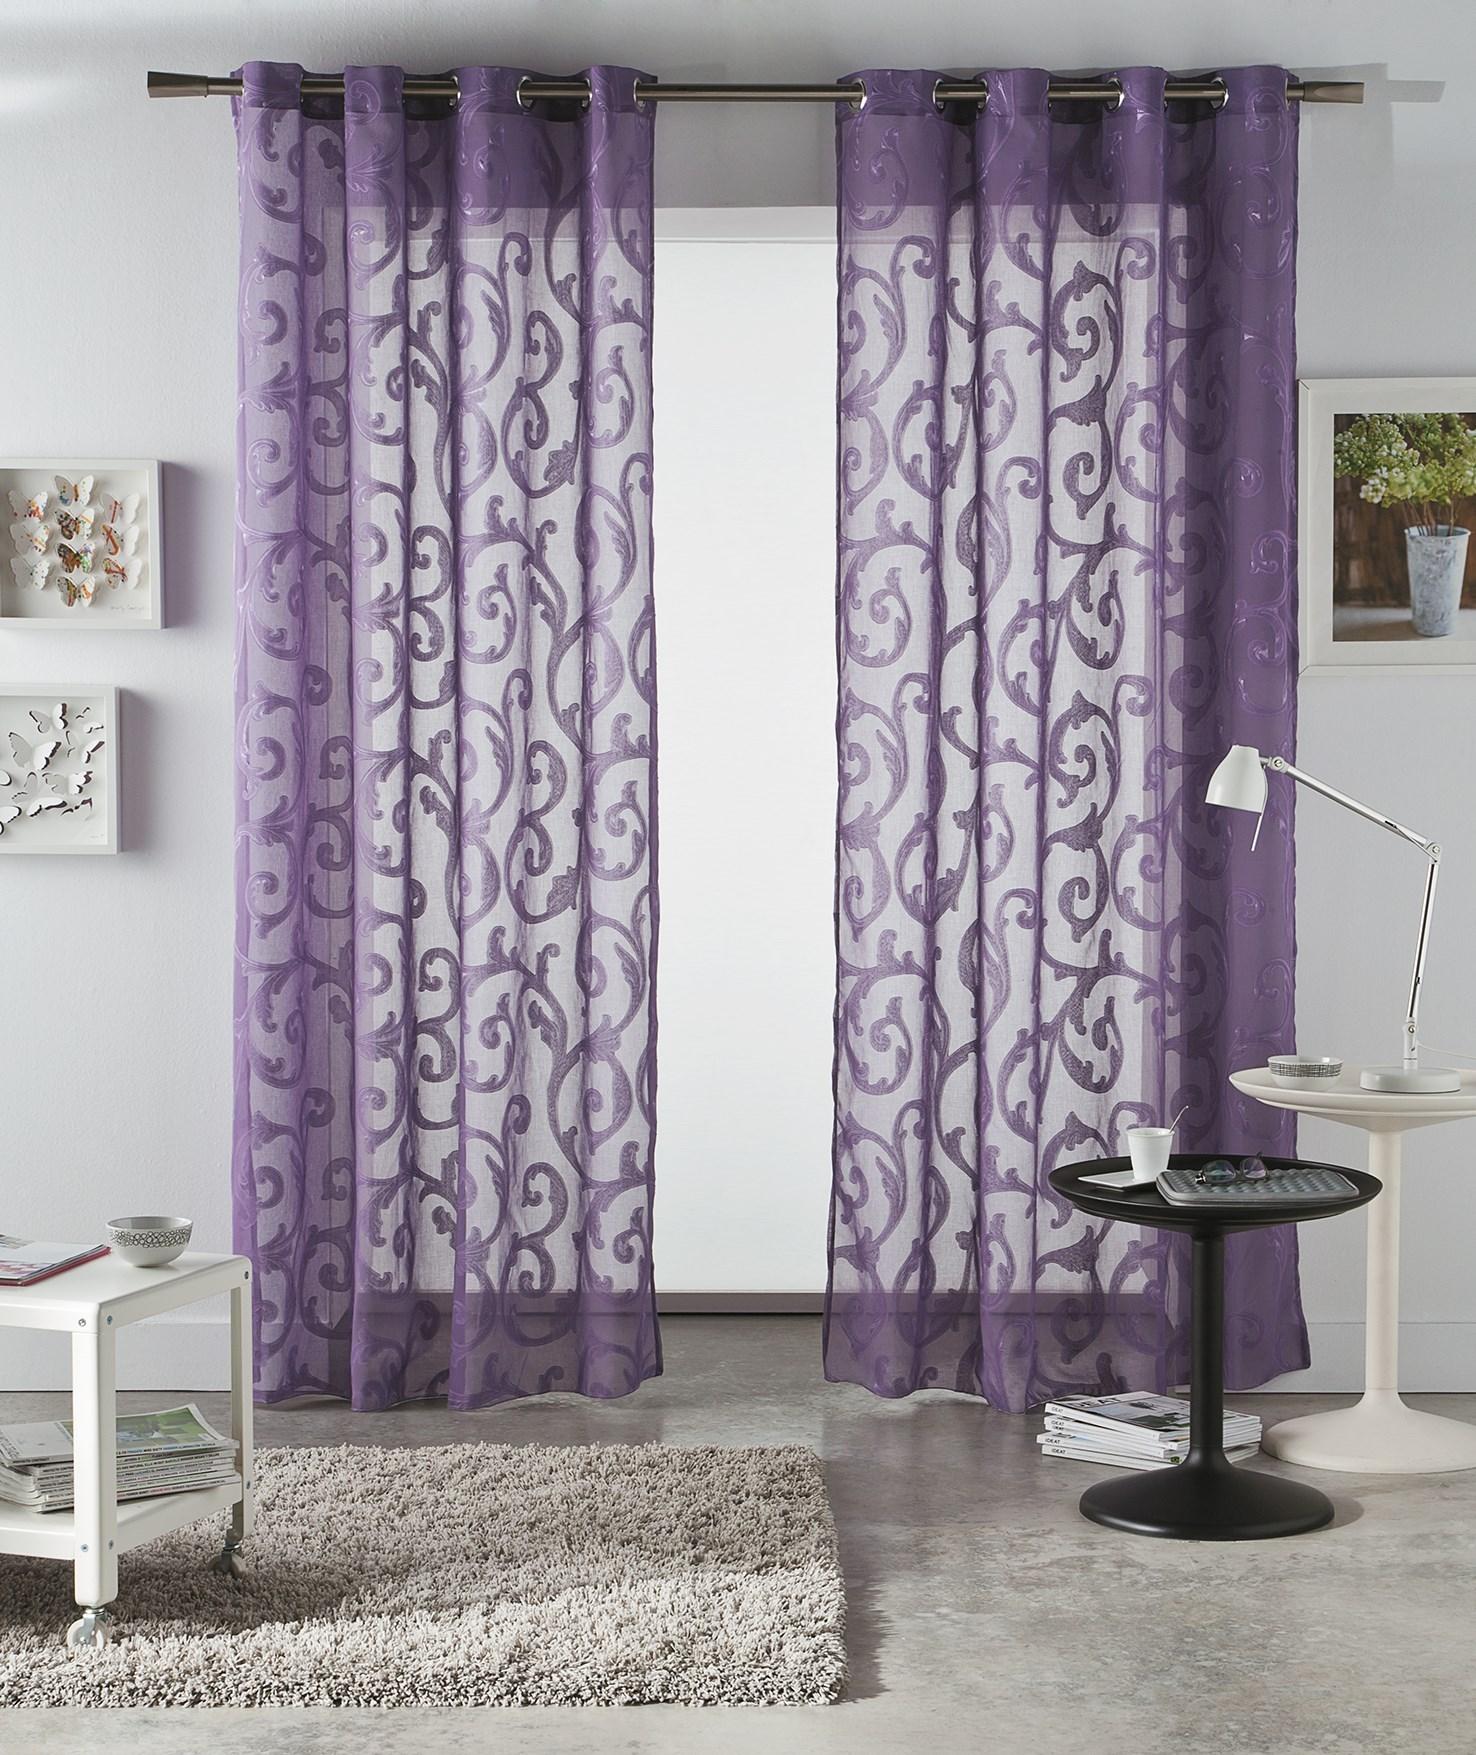 cortina leonor de fundeco - Cortinas Moradas